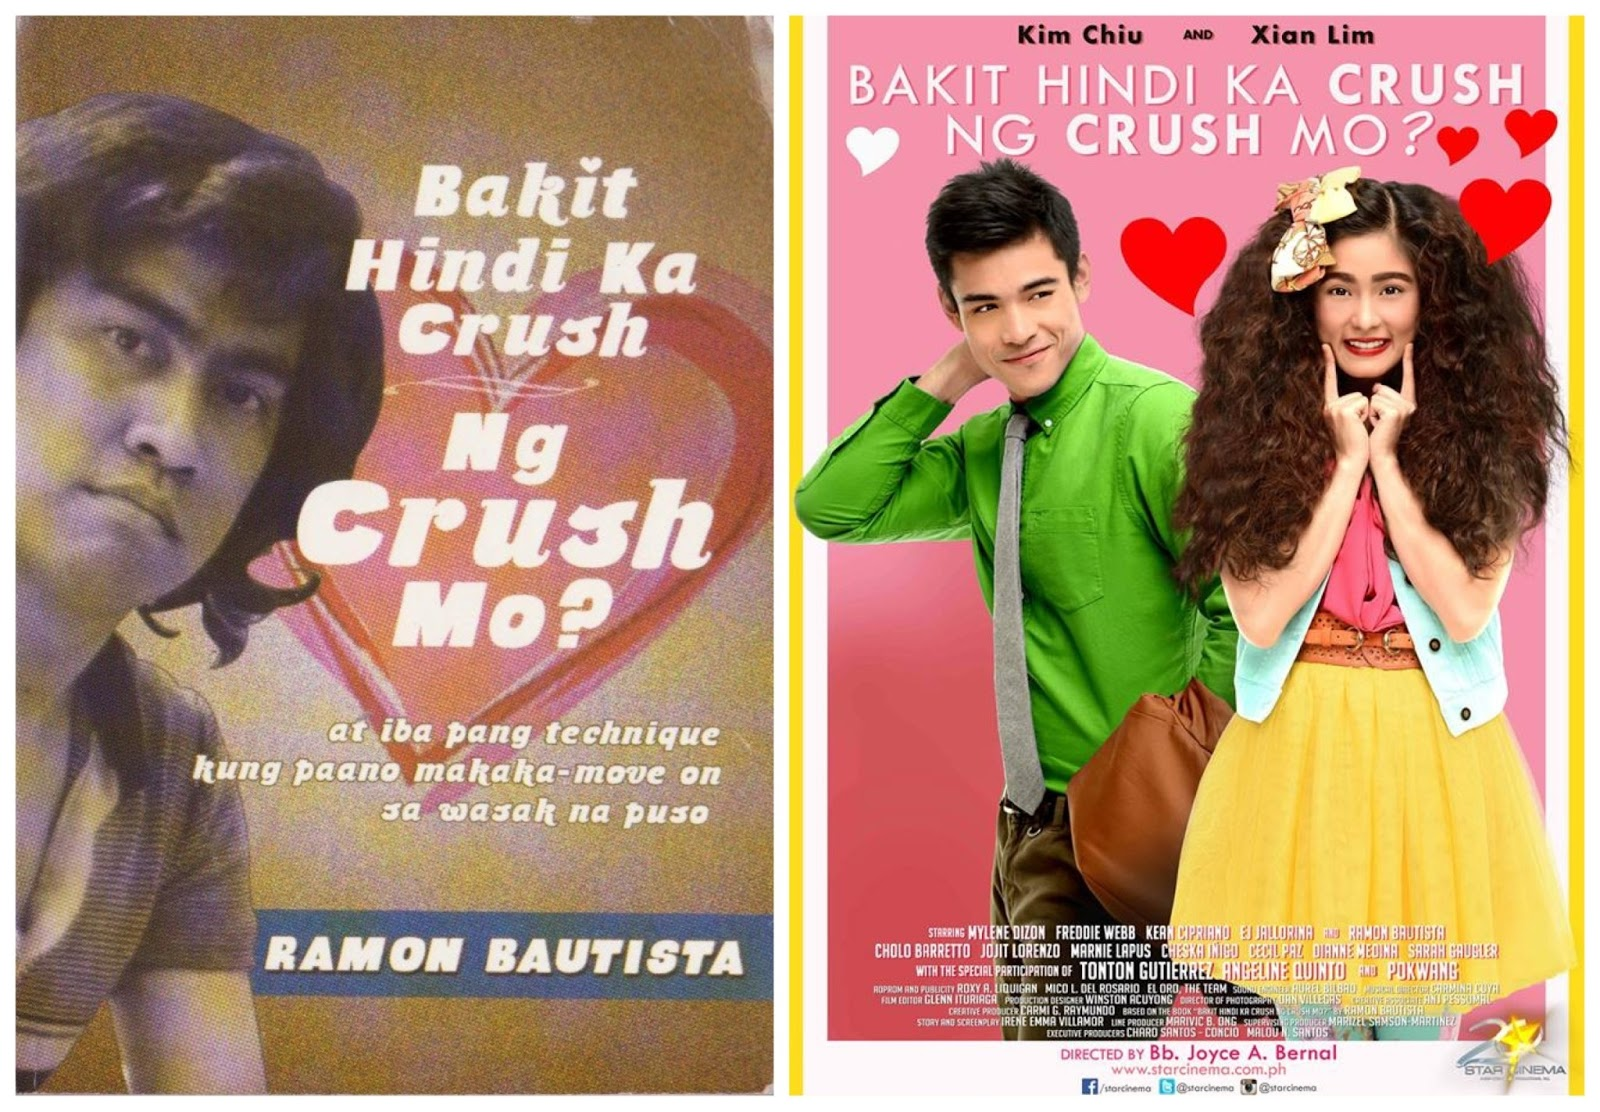 Random Full Trailer: BAKIT HINDI KA CRUSH NG CRUSH MO?